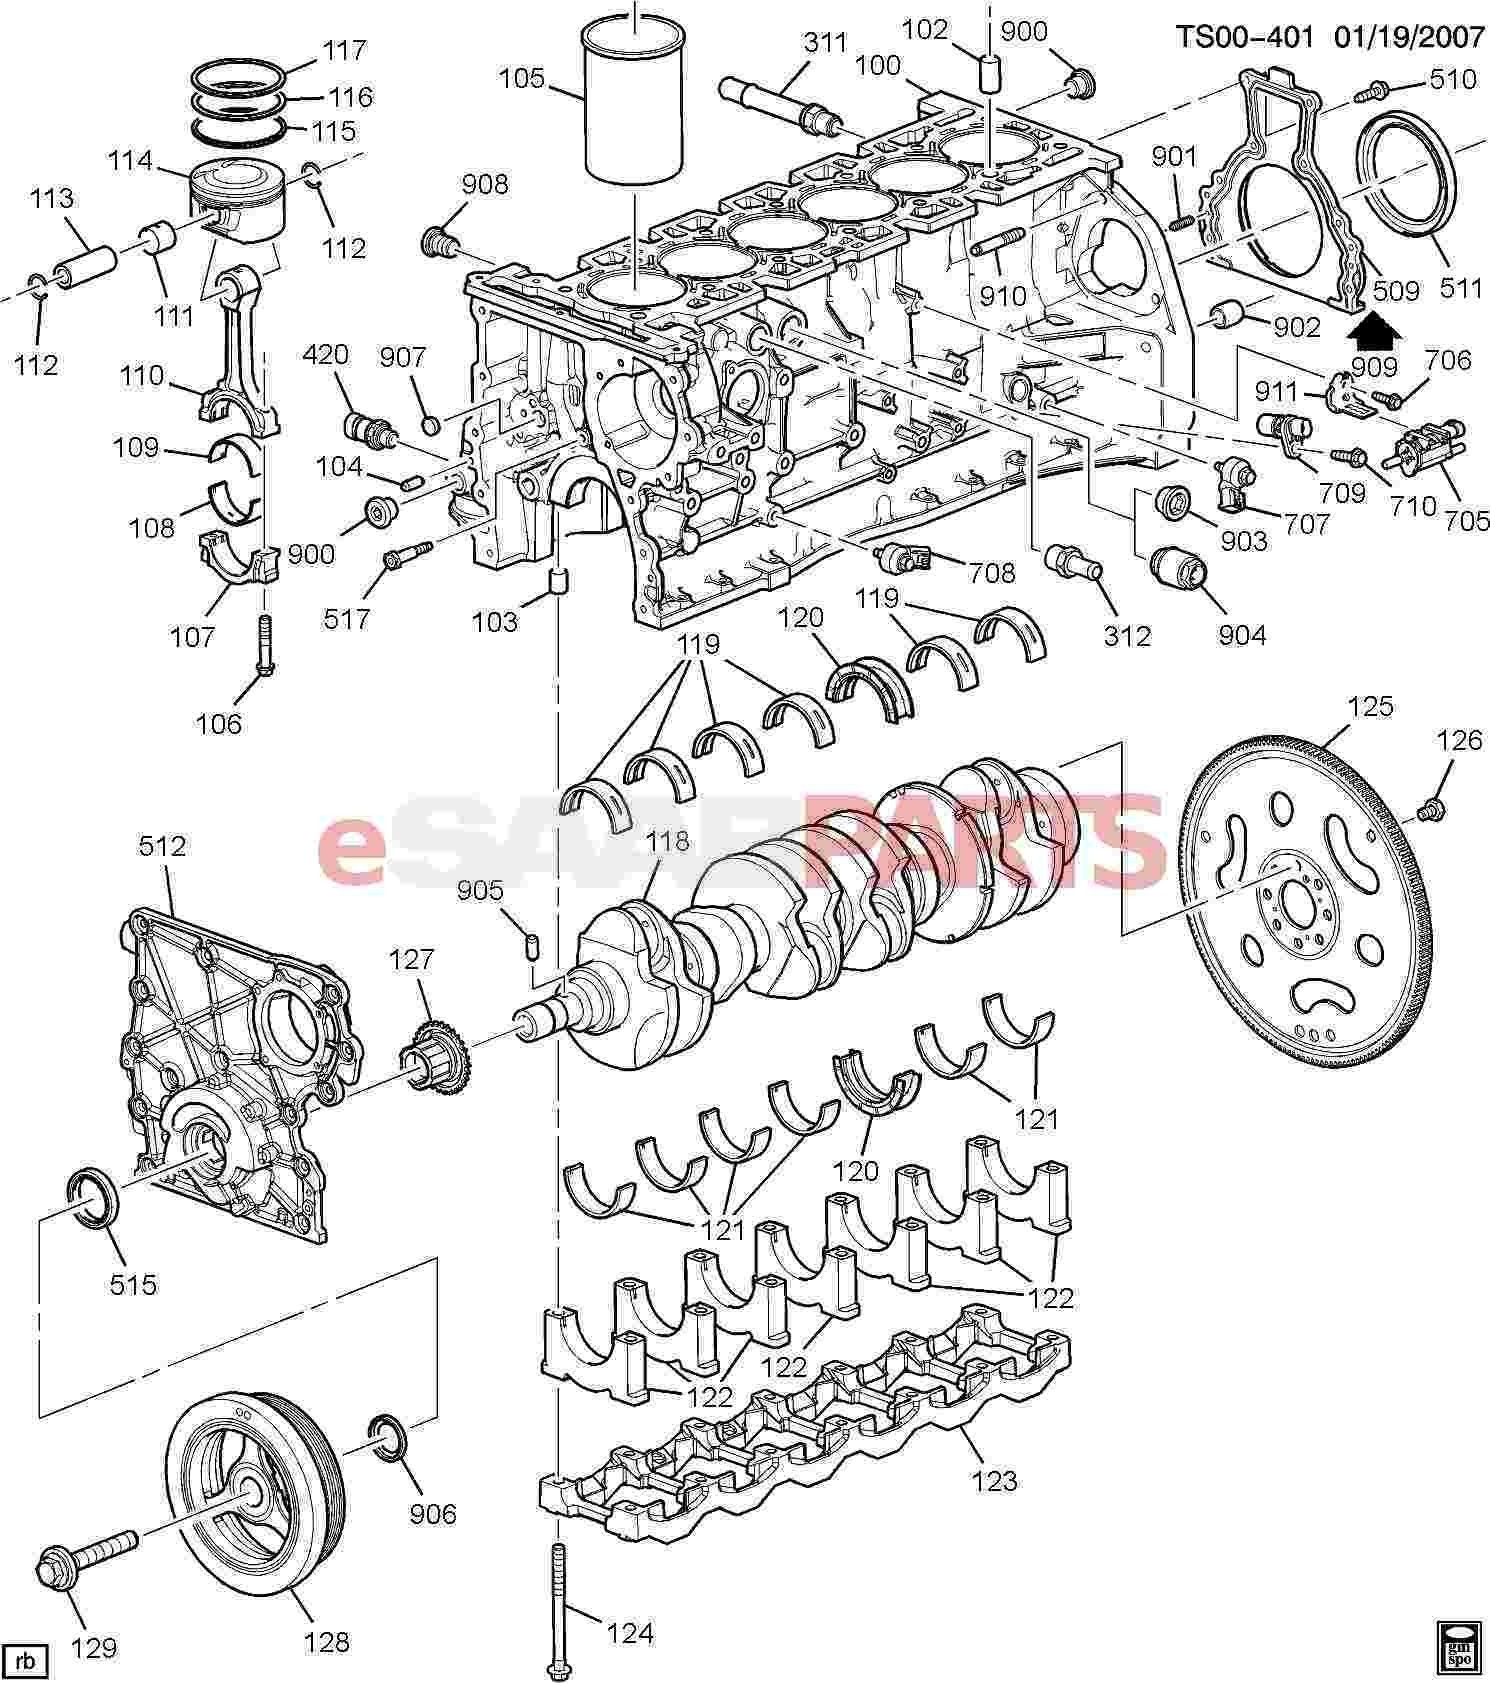 Engine Valve Parts Diagram Auto Engine Parts Diagram Of Engine Valve Parts Diagram